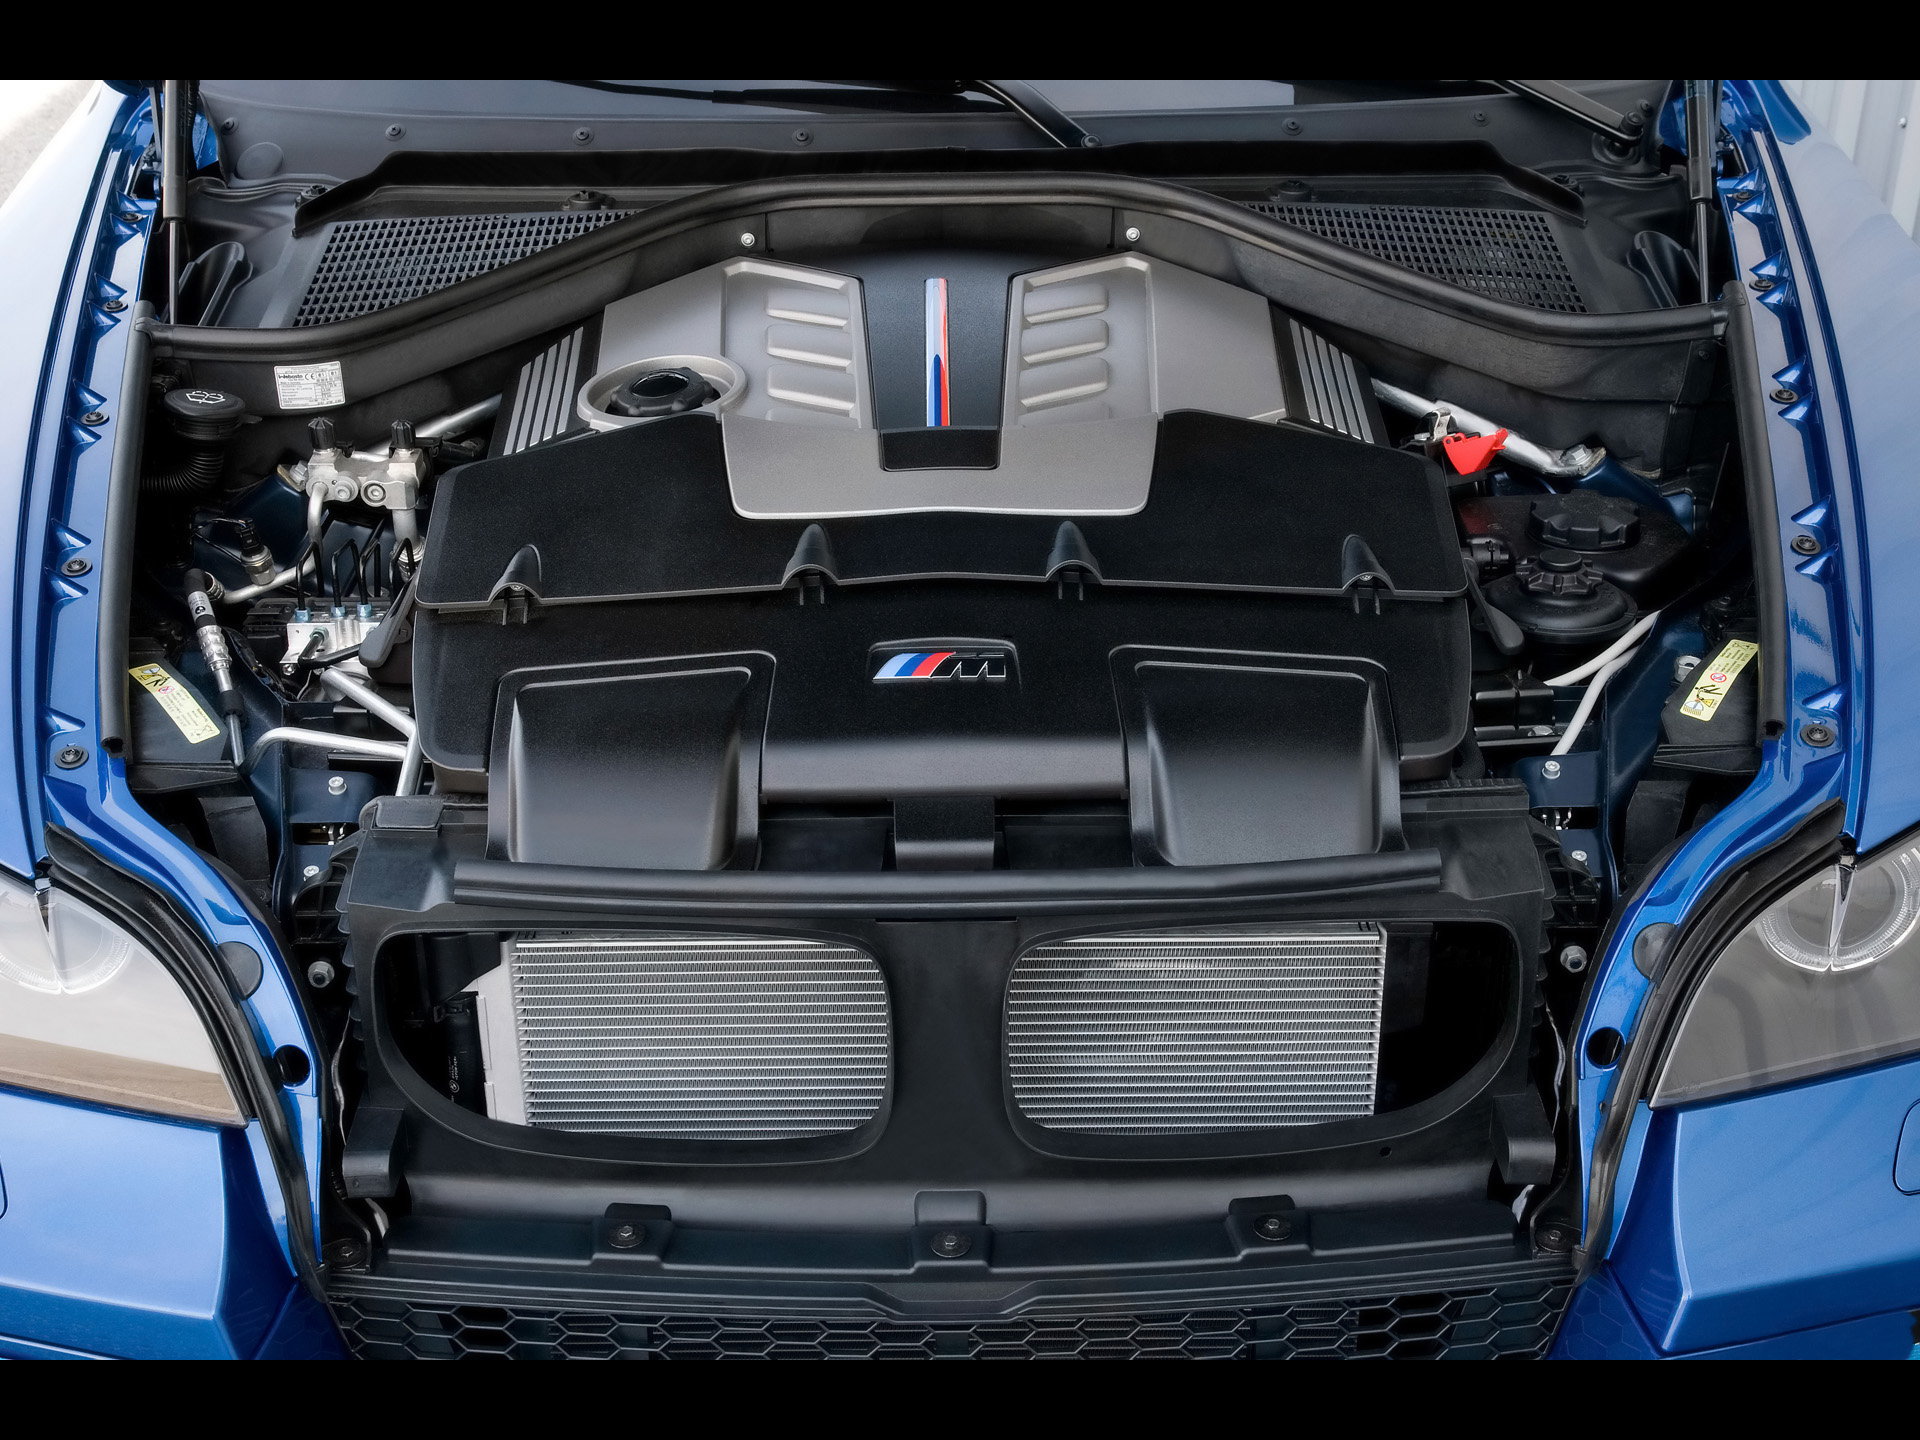 48+] BMW X5 M Wallpaper on WallpaperSafari